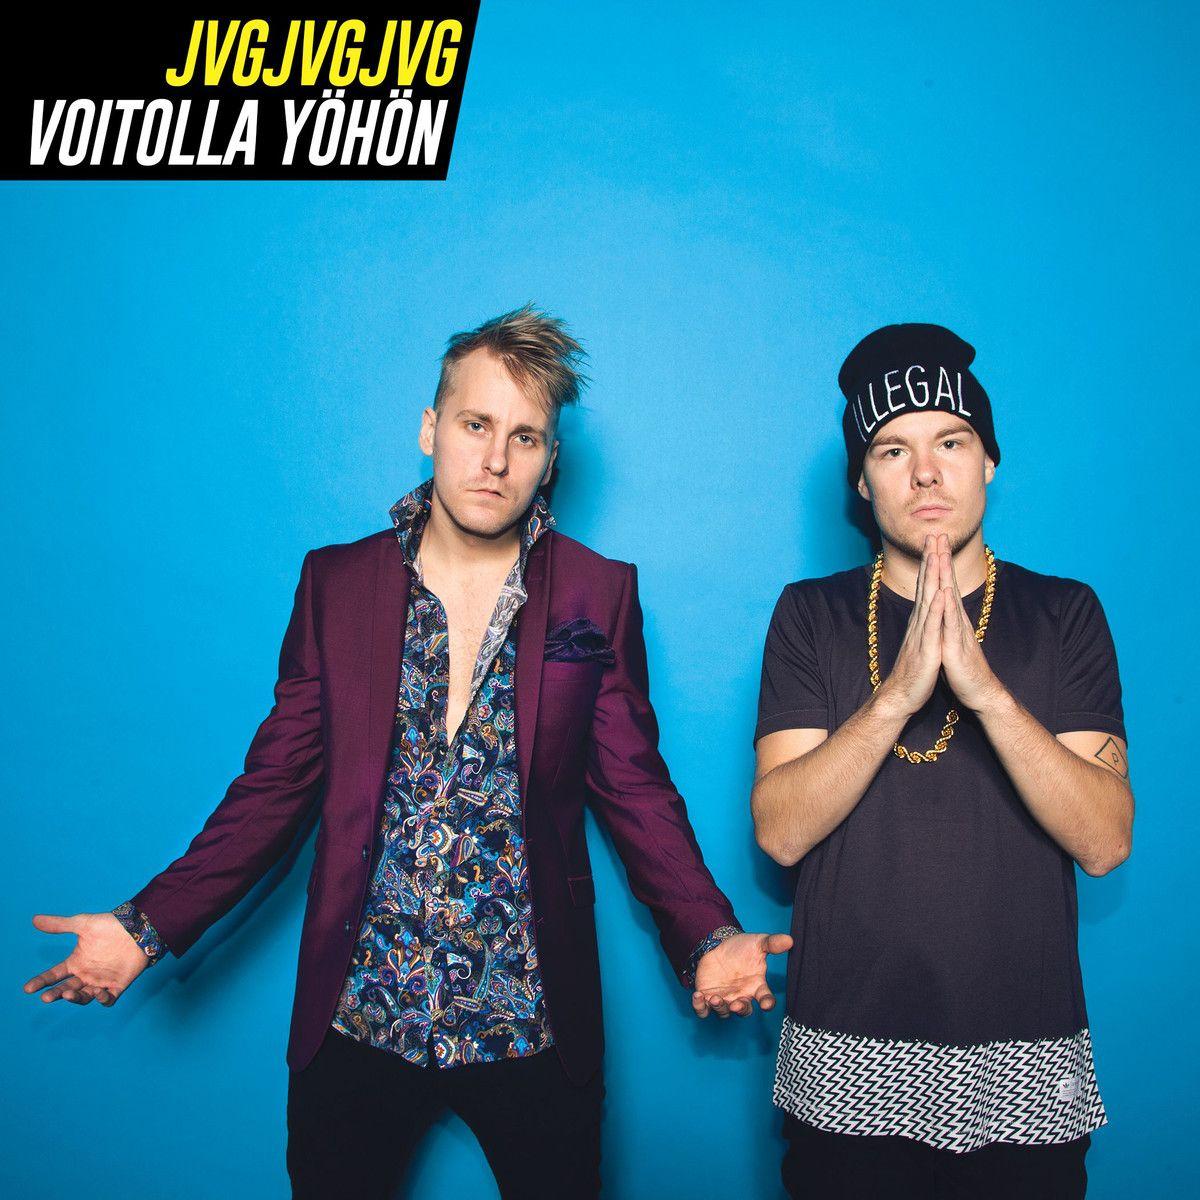 Jvg - Voitolla Yöhön album cover